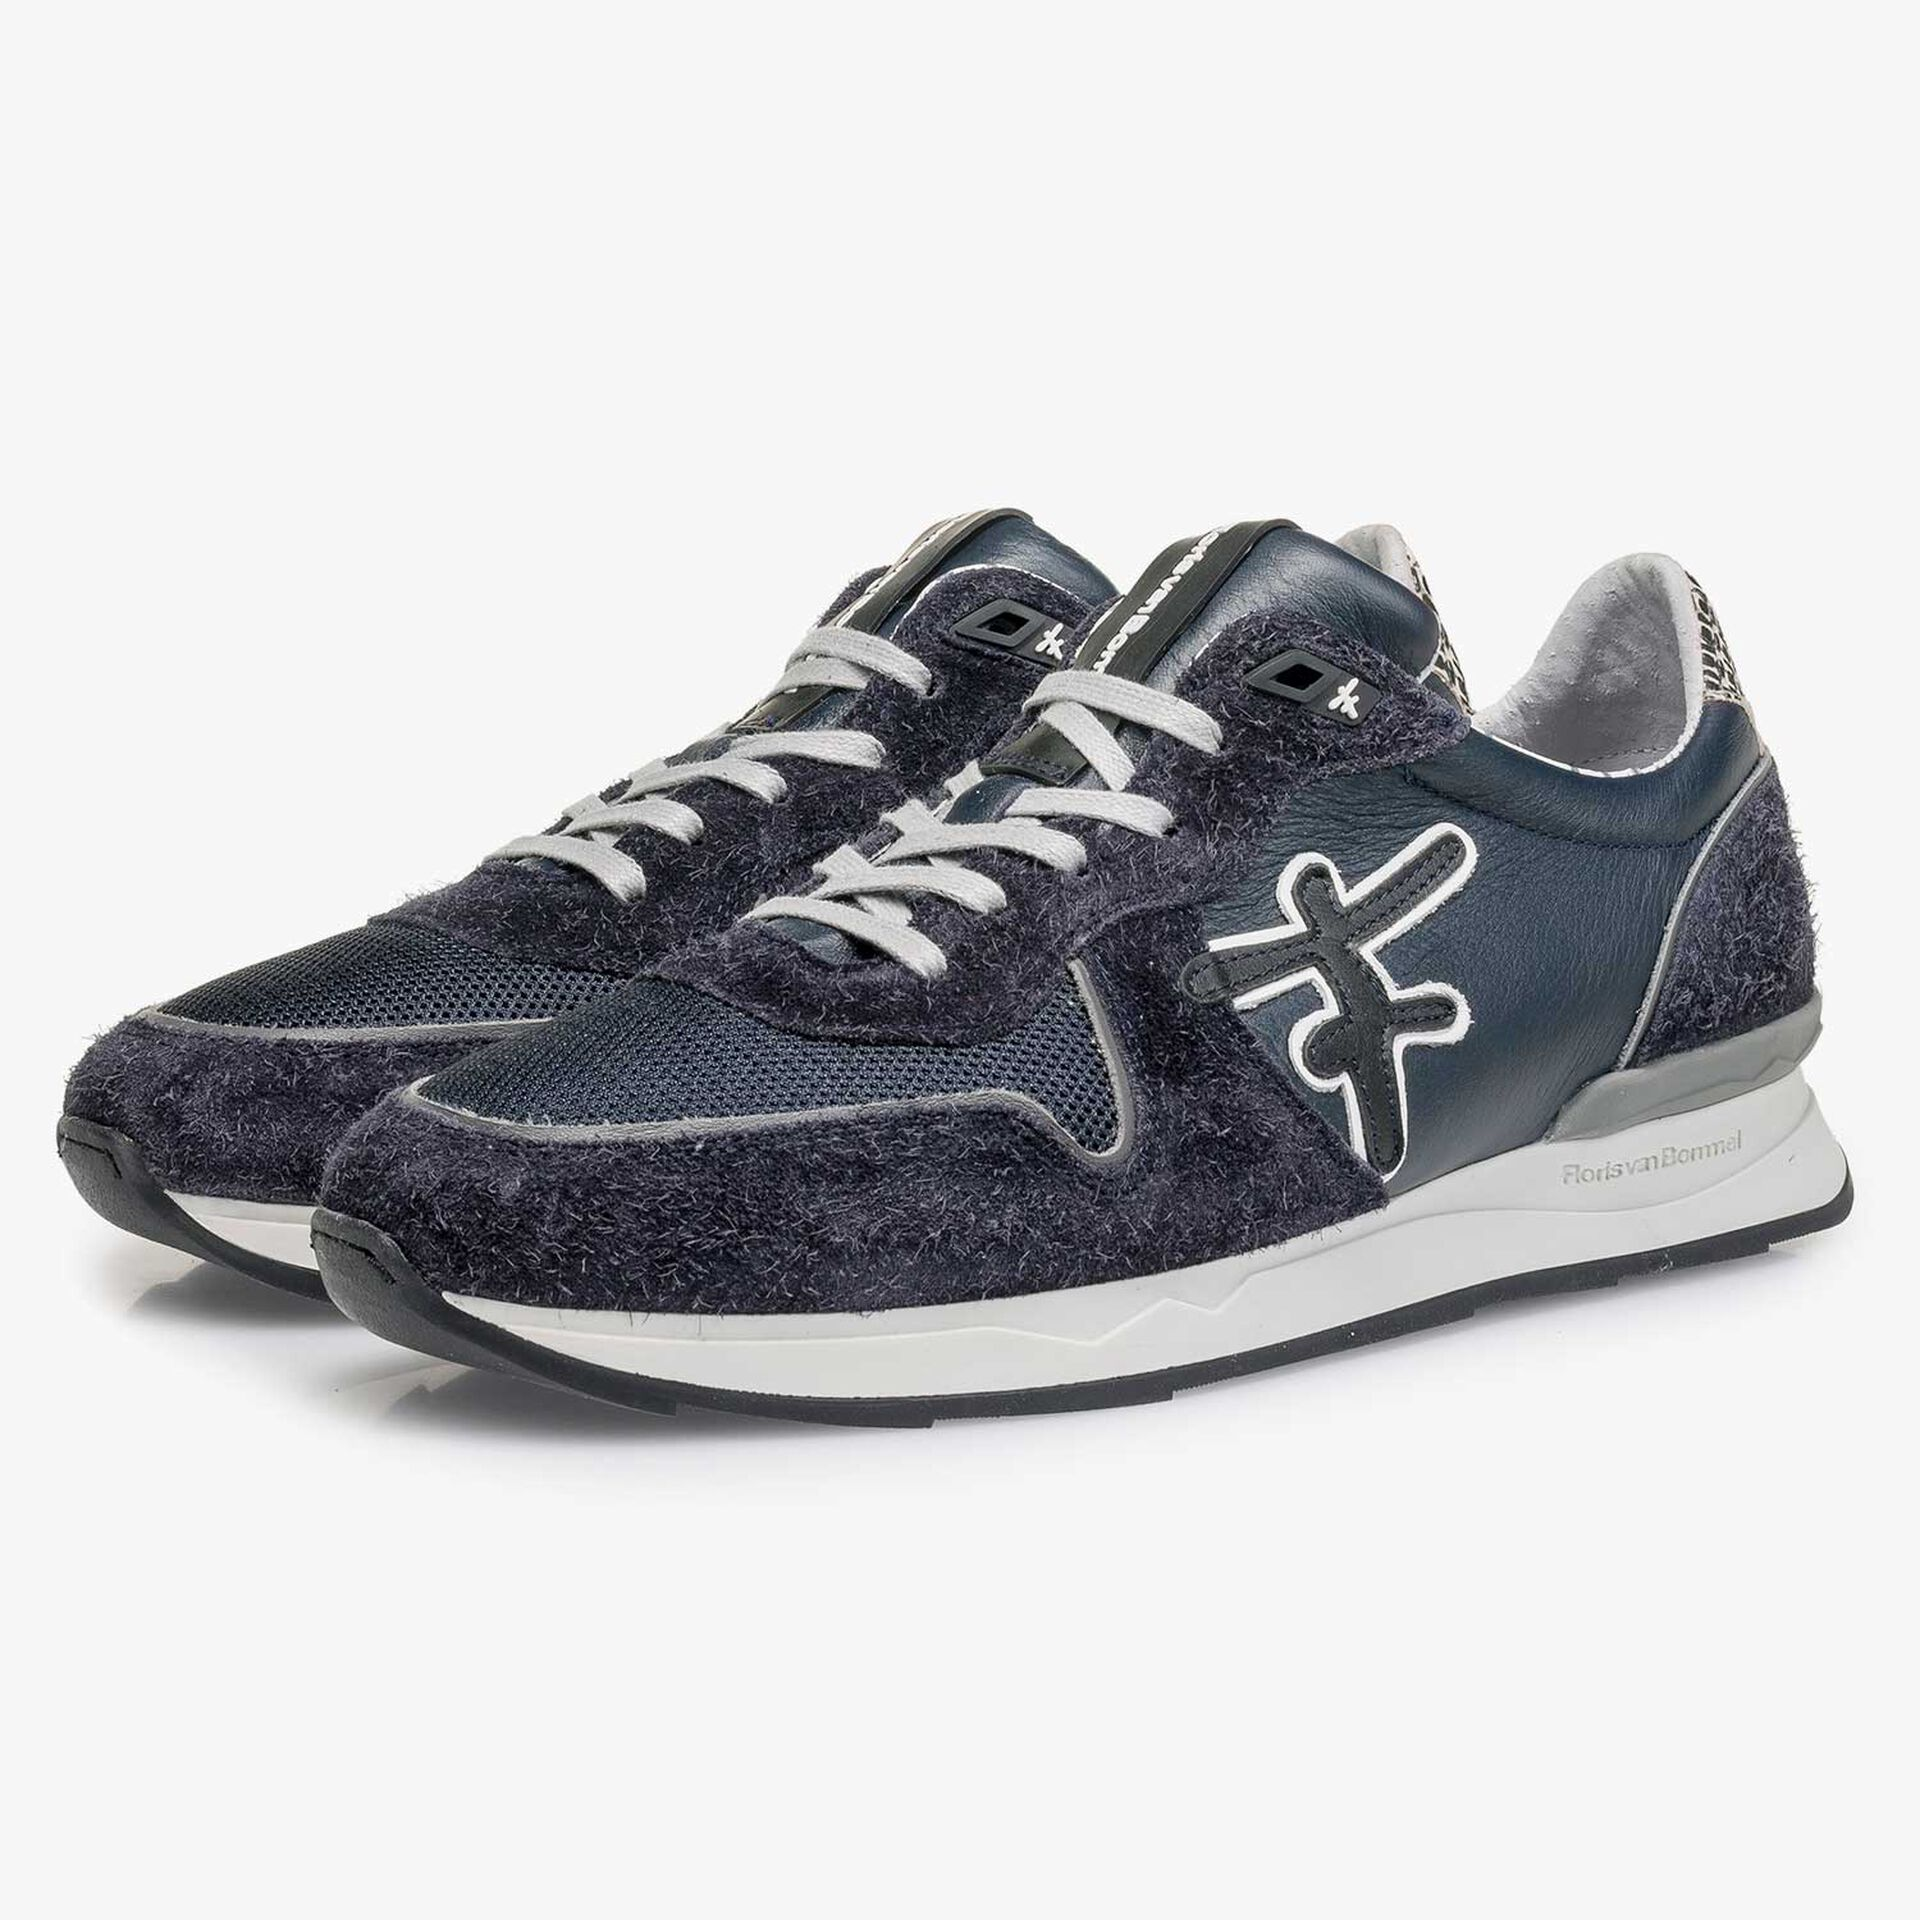 Donkerblauwe kalfsleren sneaker